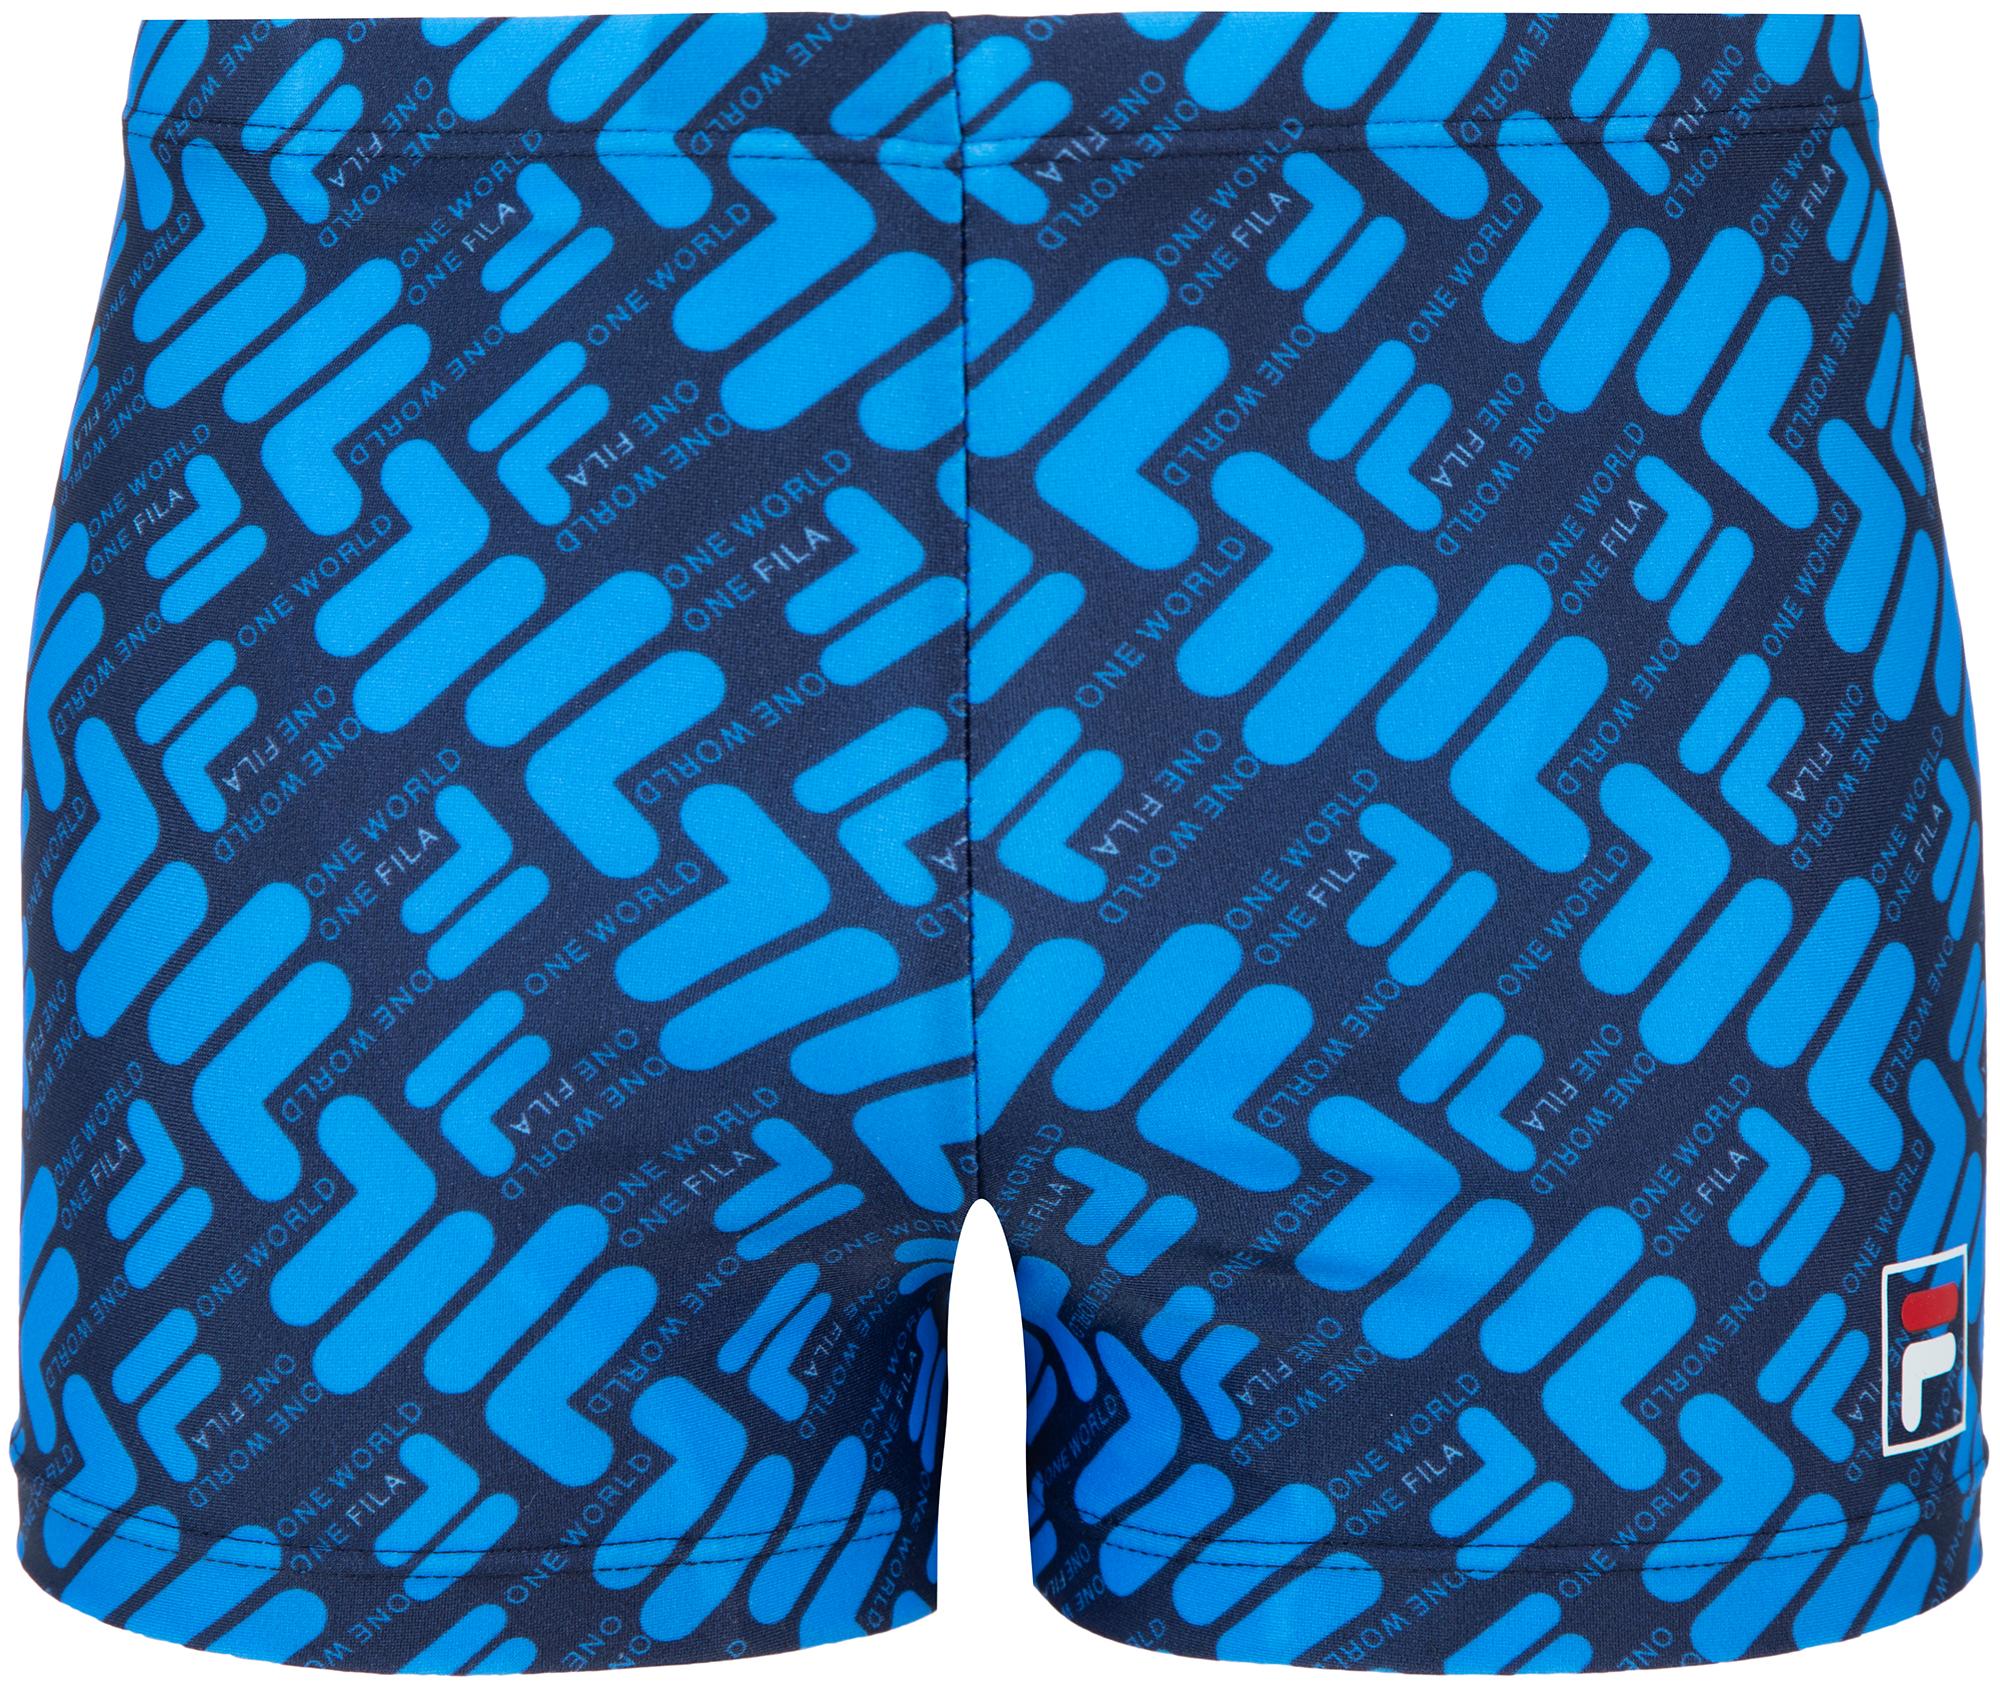 fila плавки для мальчиков fila размер 128 Fila Плавки-шорты для мальчиков FILA, размер 128